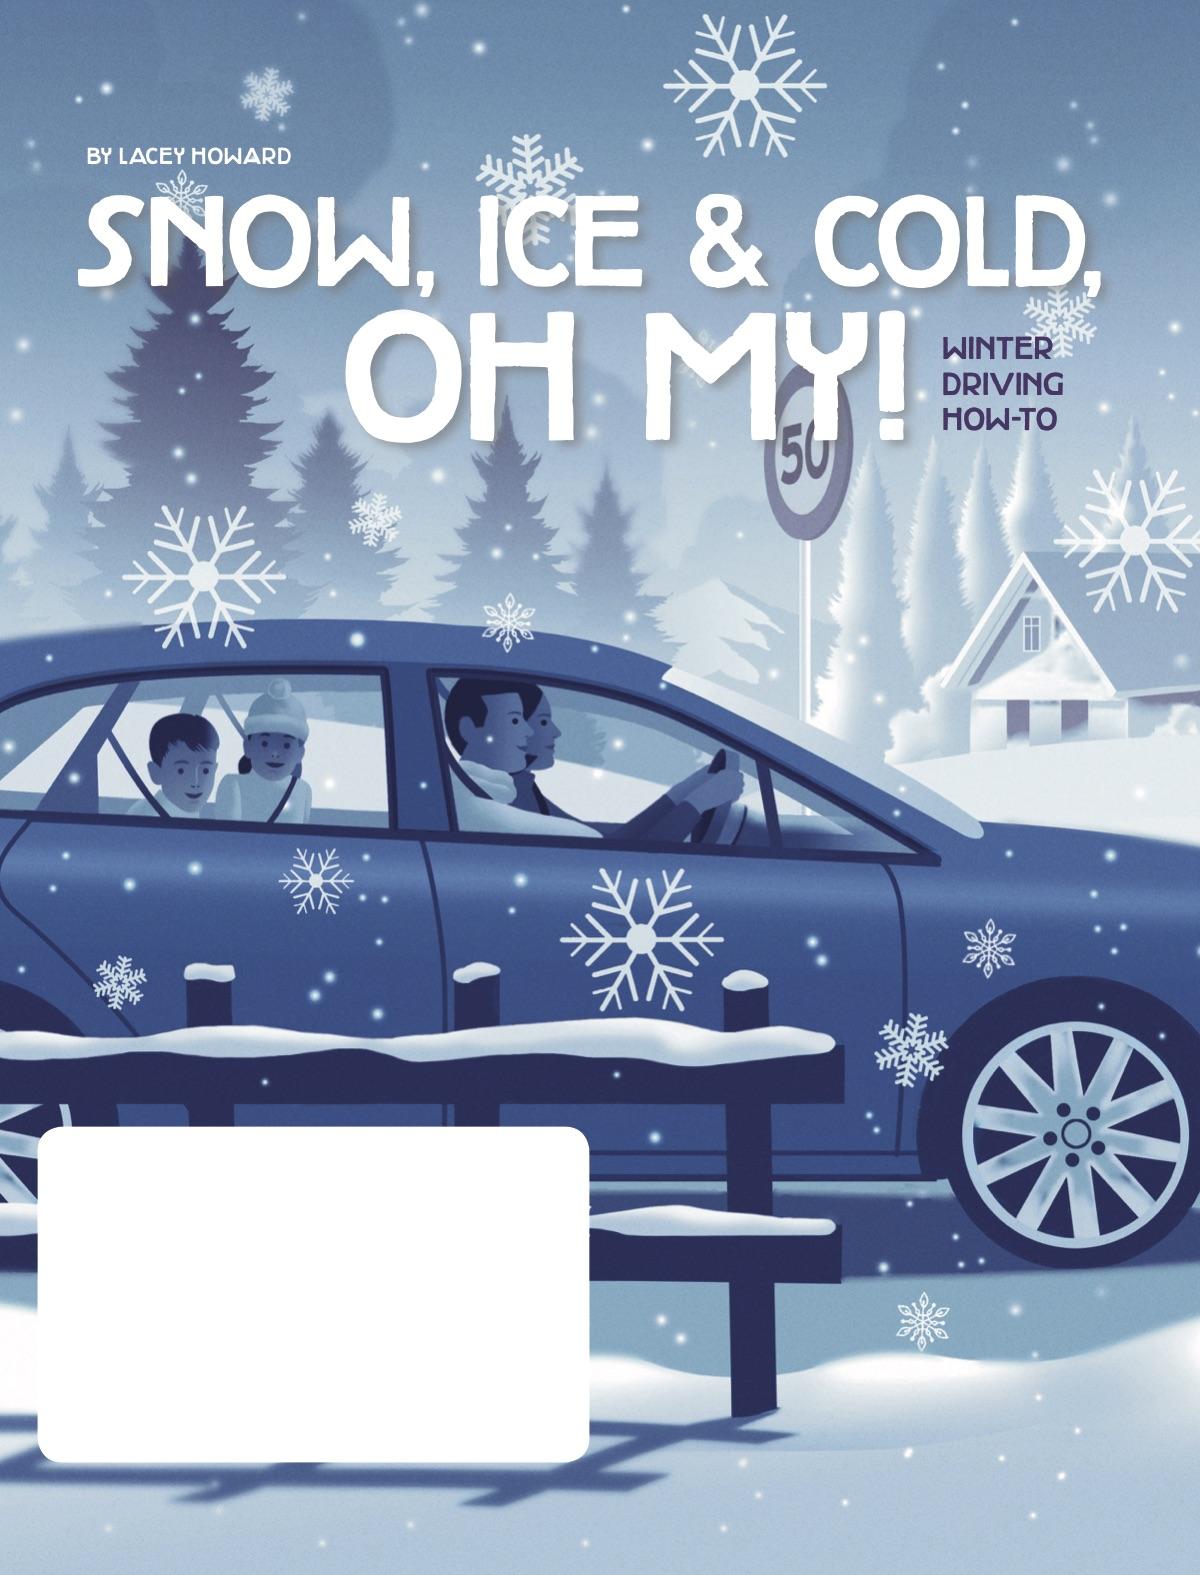 winter driving 1.jpg